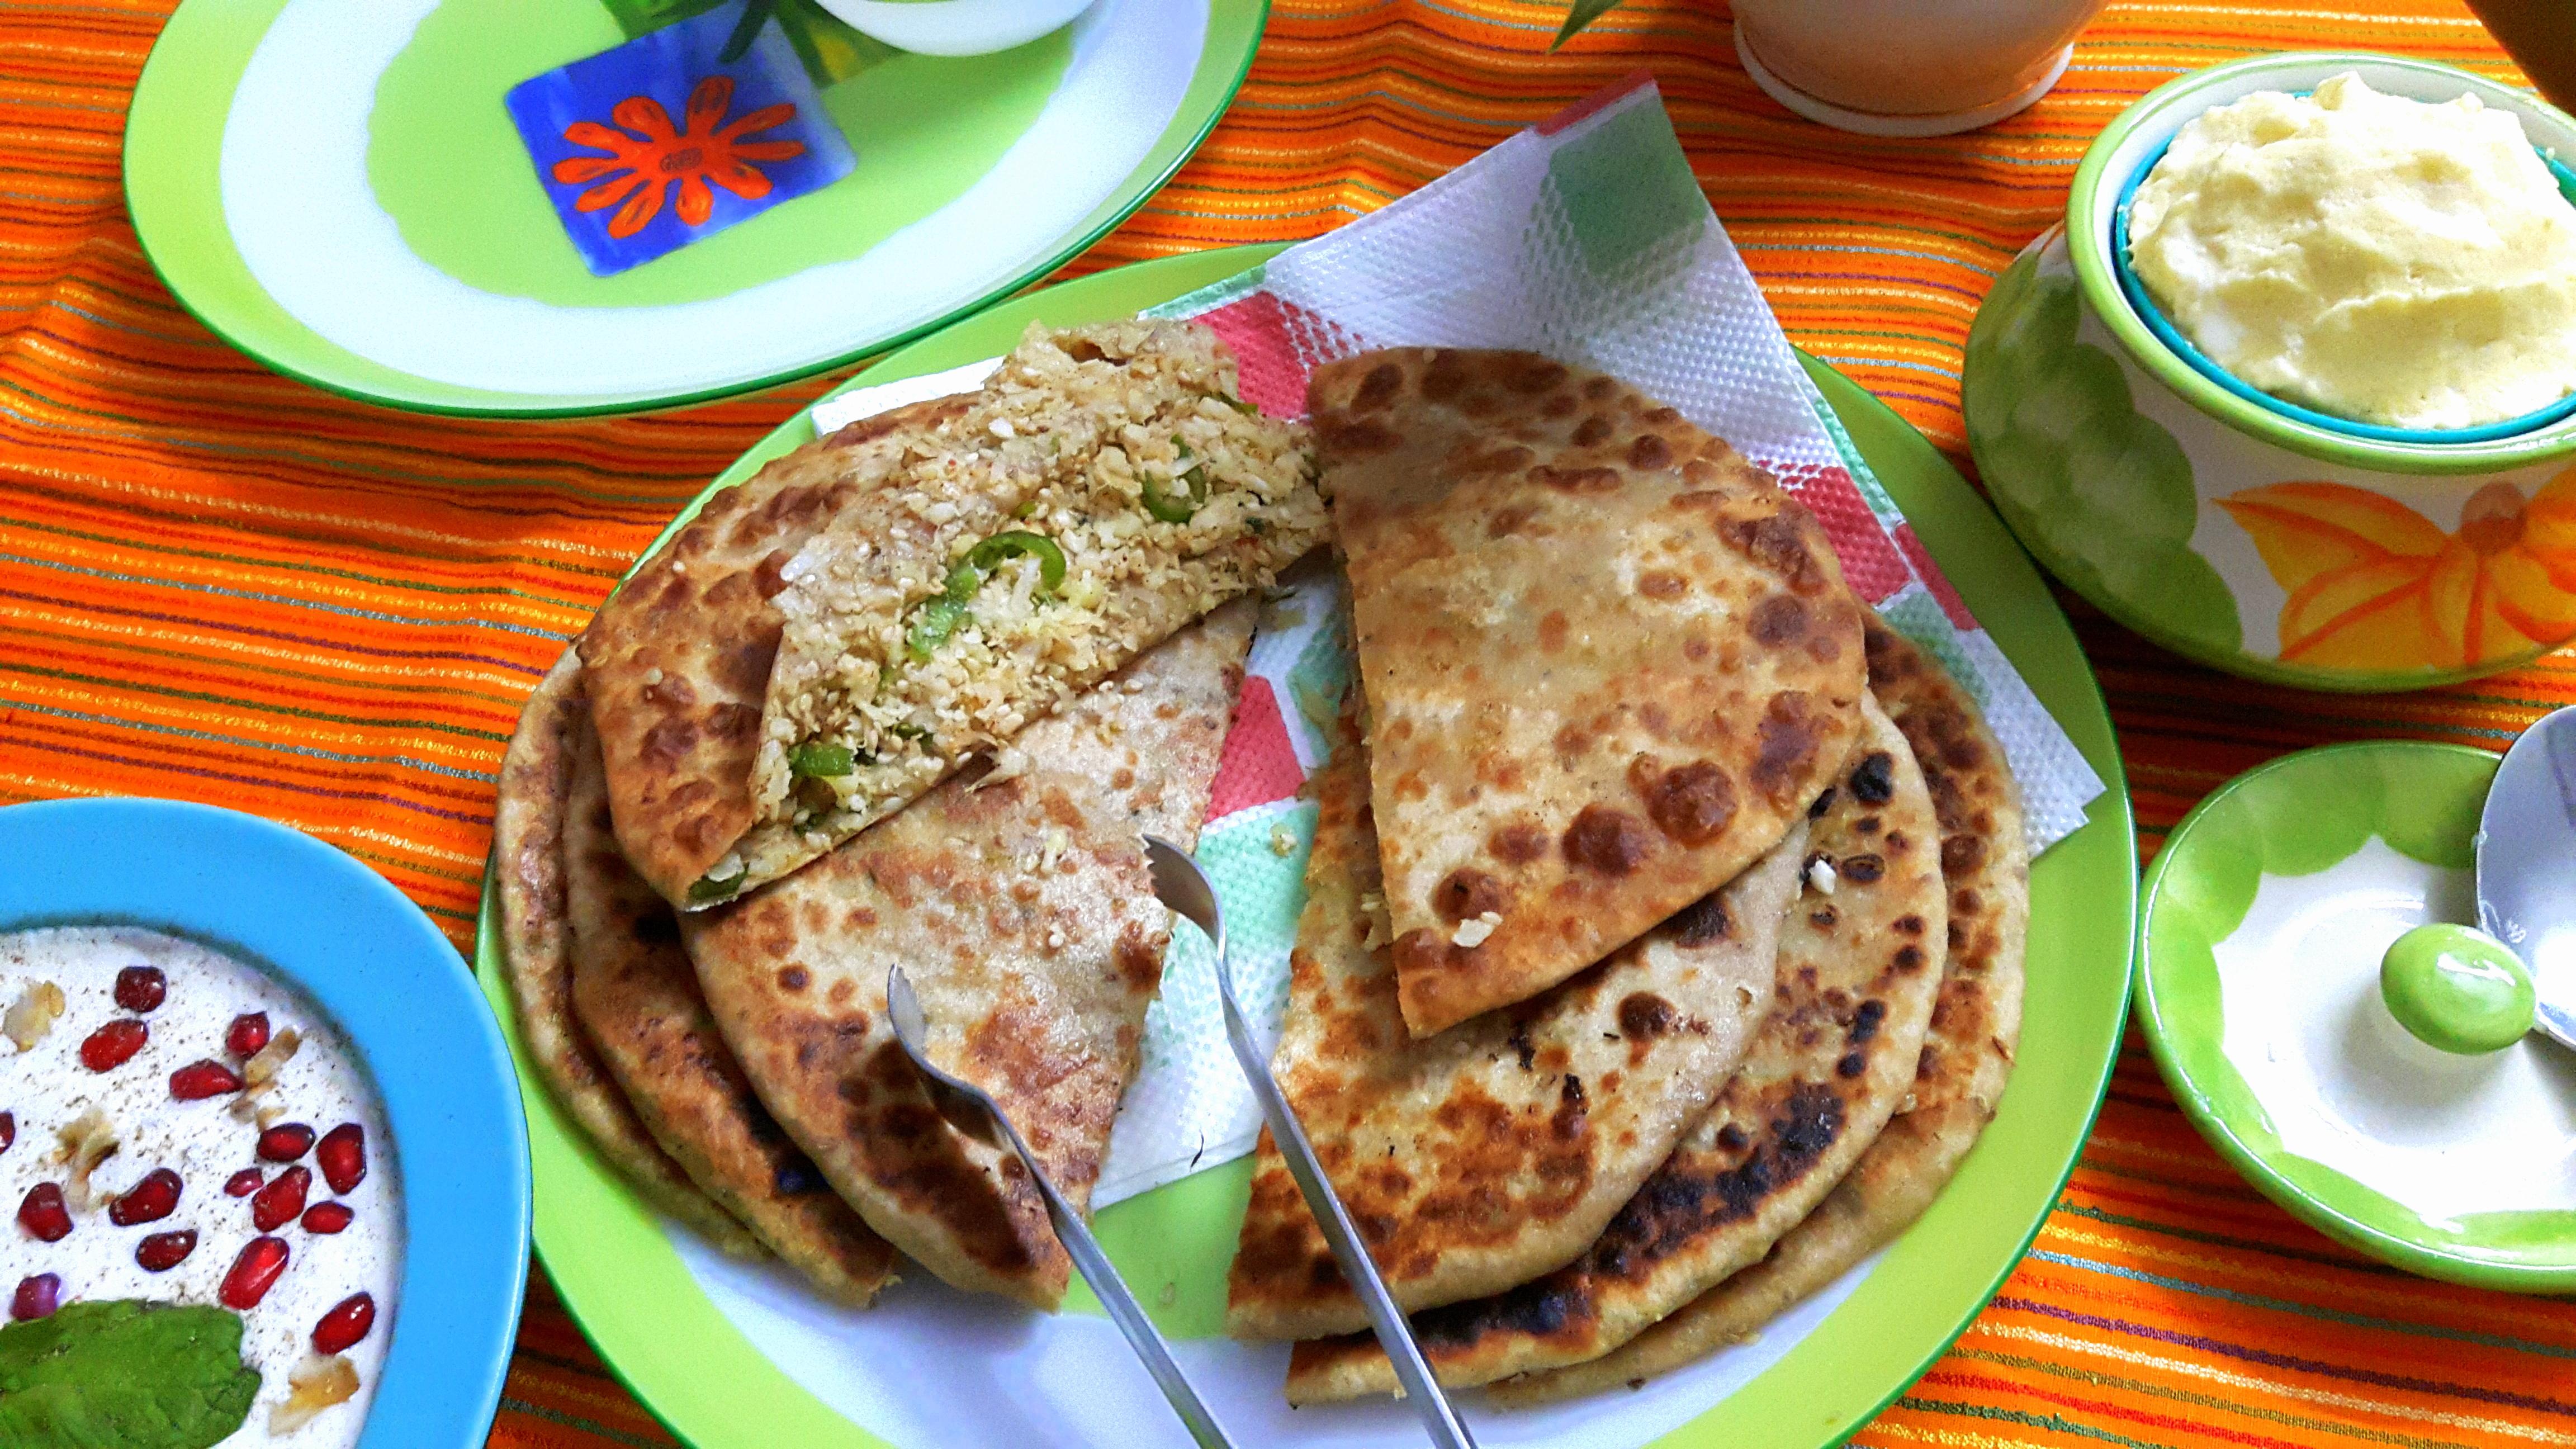 Gobhi stuff paratha (cauliflower paratha)